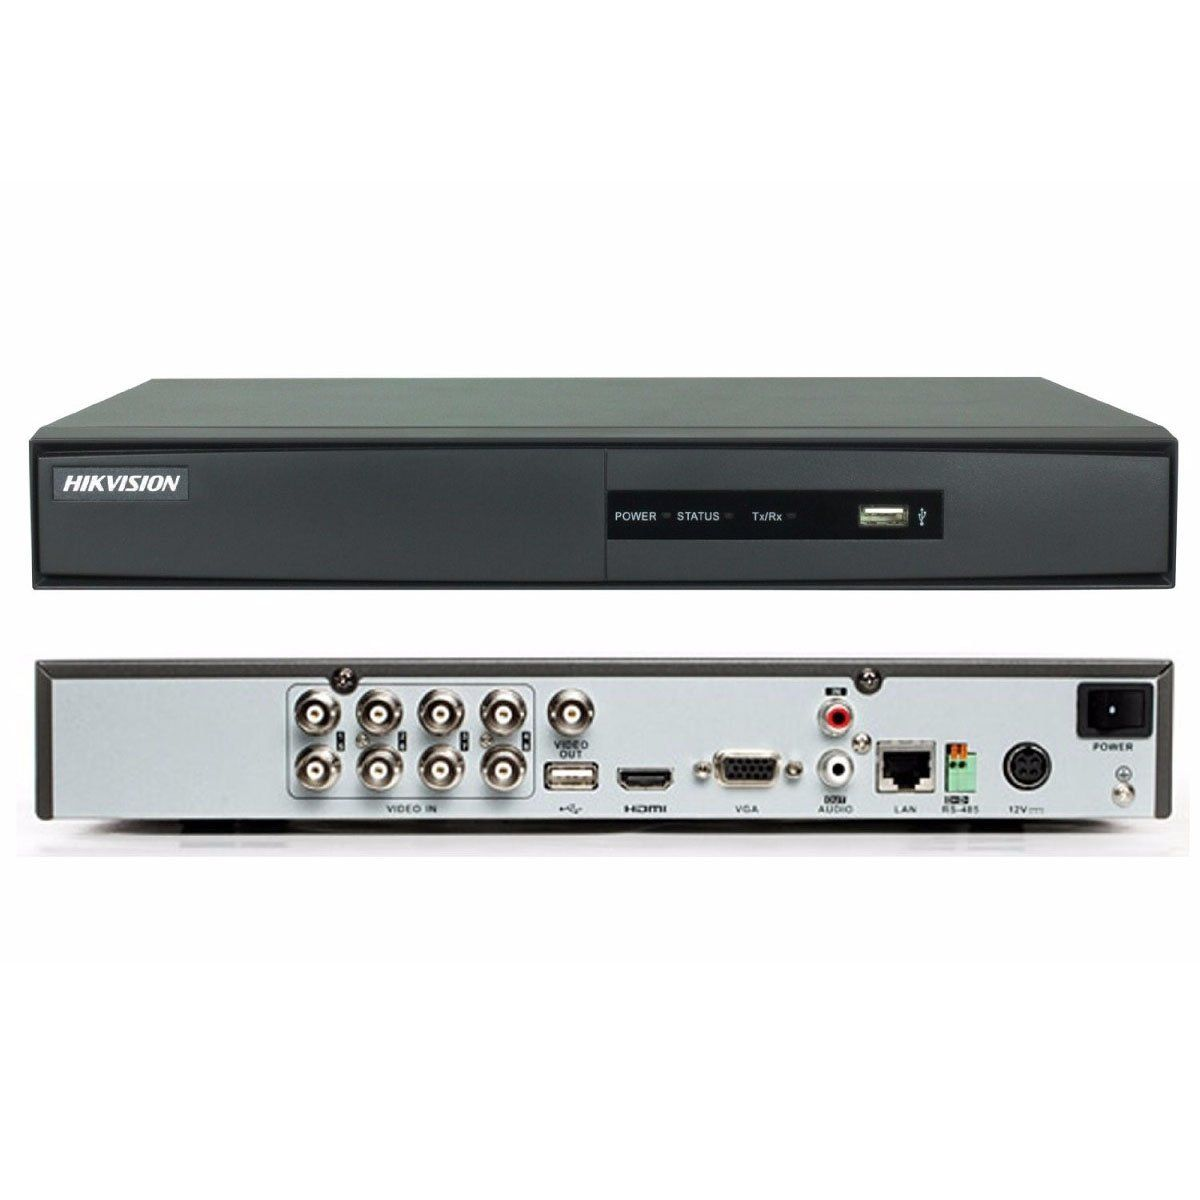 DVR 8 Canais Digital Turbo HD DS 7208HGHI-F1/N Hikvision